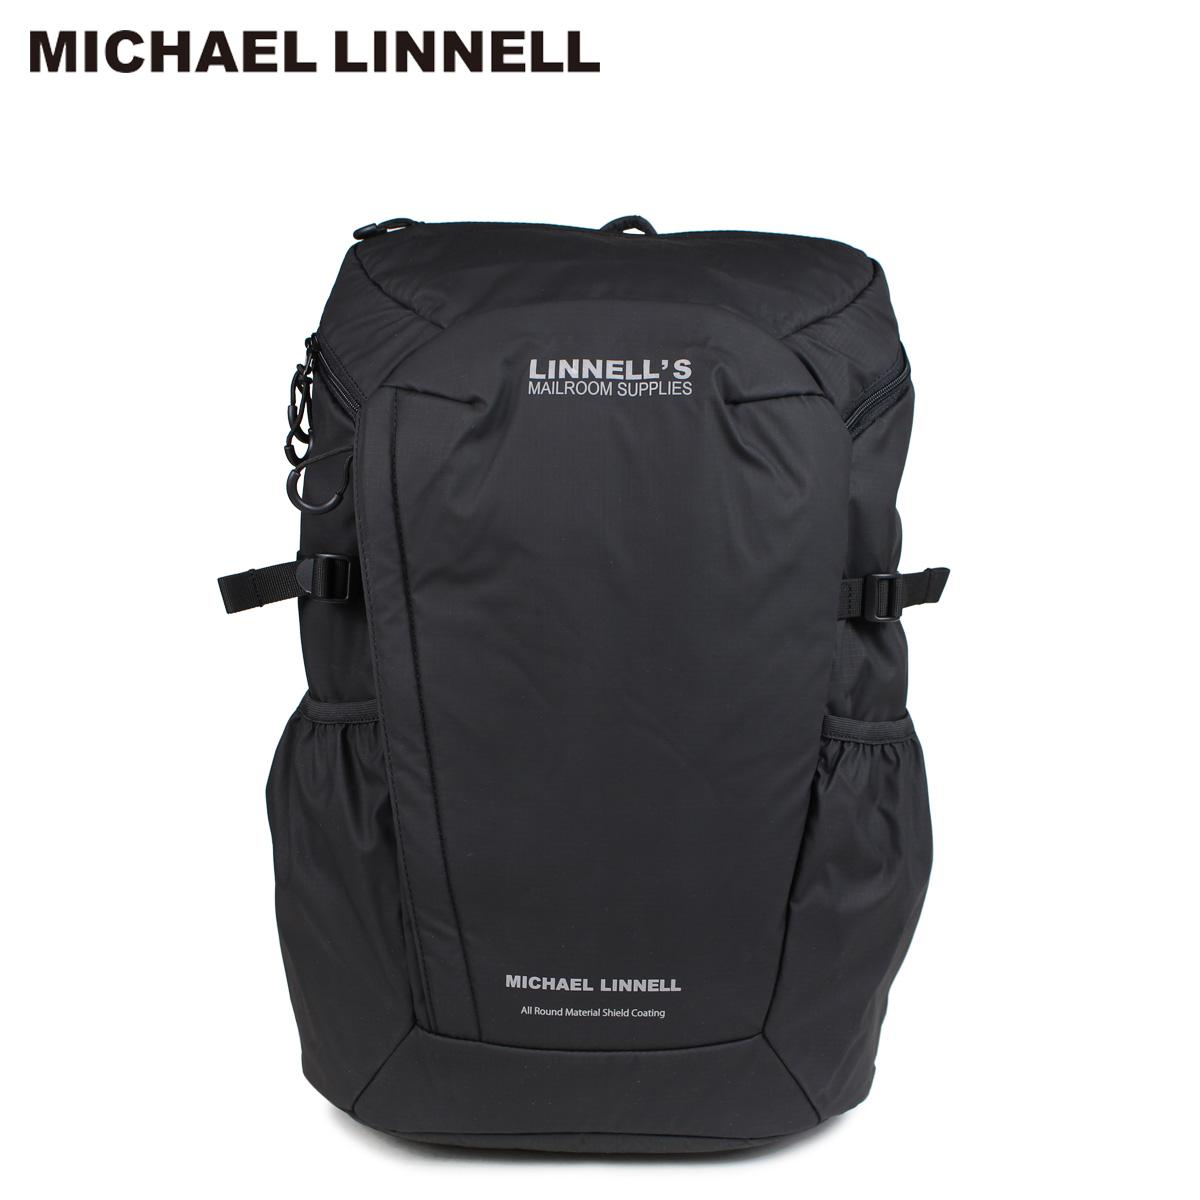 MICHAEL LINNELL BACKPACK マイケルリンネル リュック バッグ 29L メンズ レディース バックパック ブラック MLAC-01 [10/22 新入荷]